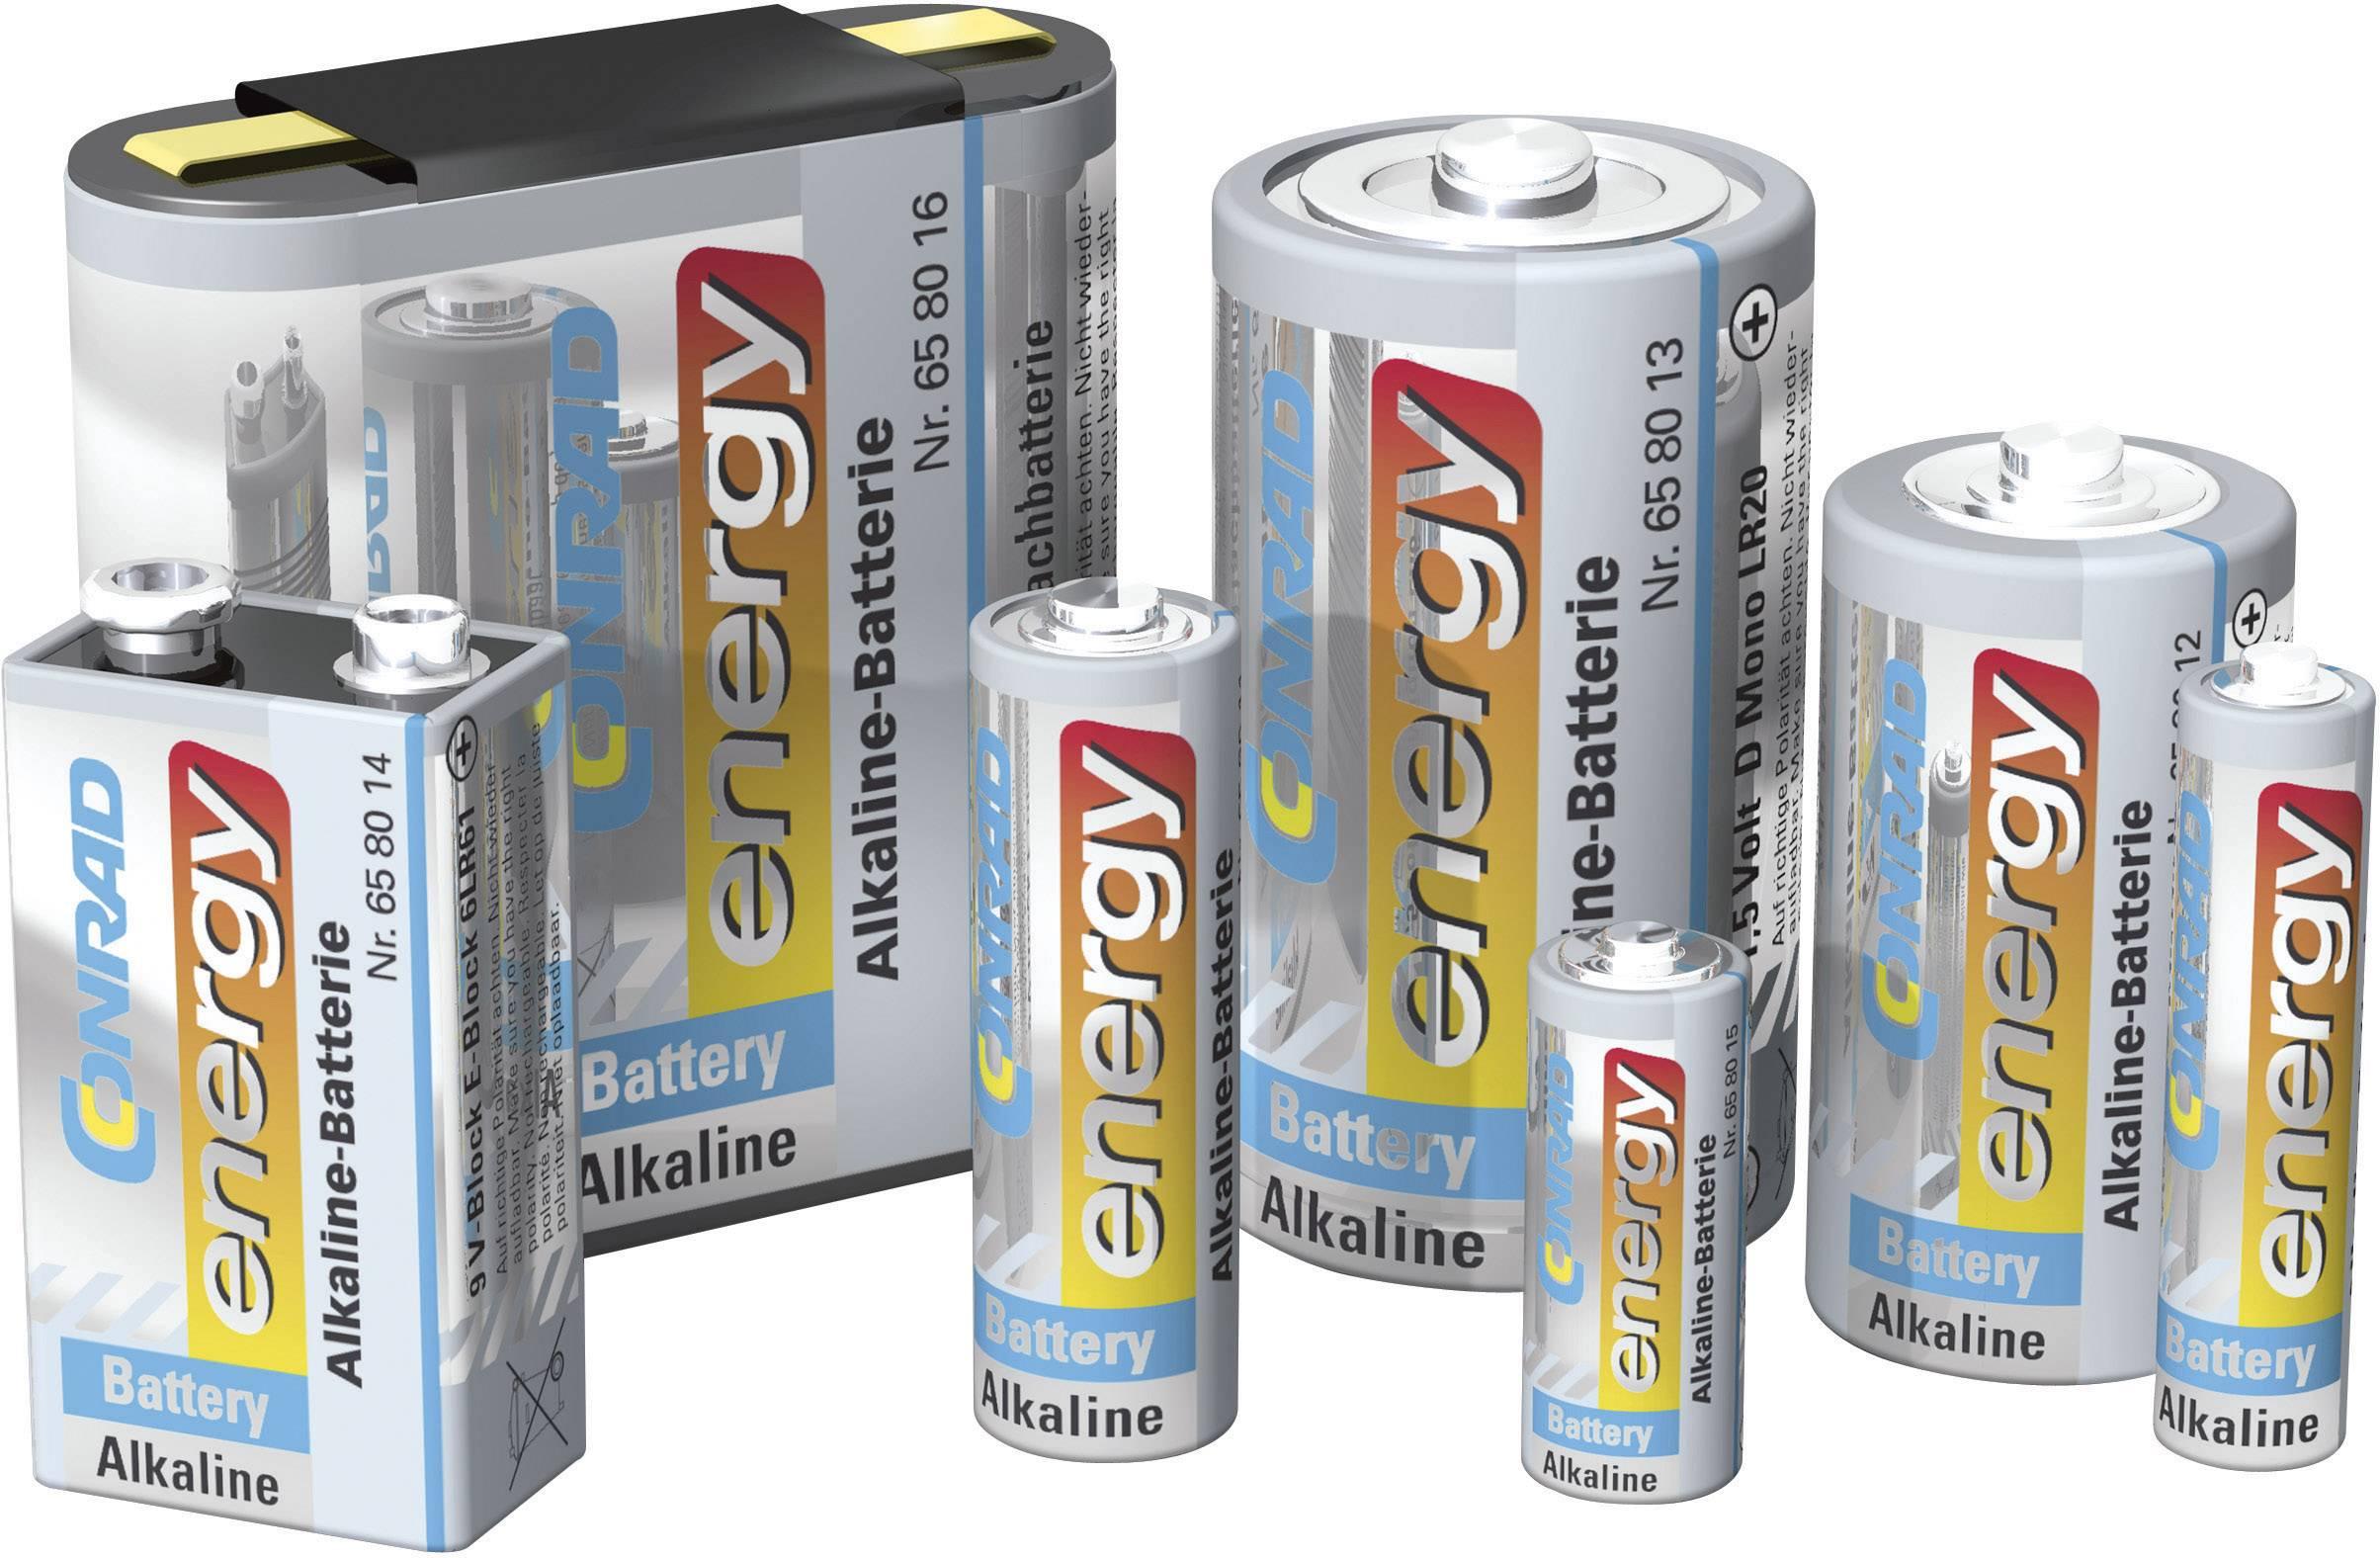 Baterie Conrad energy Alkaline, typ AA, 4 ks